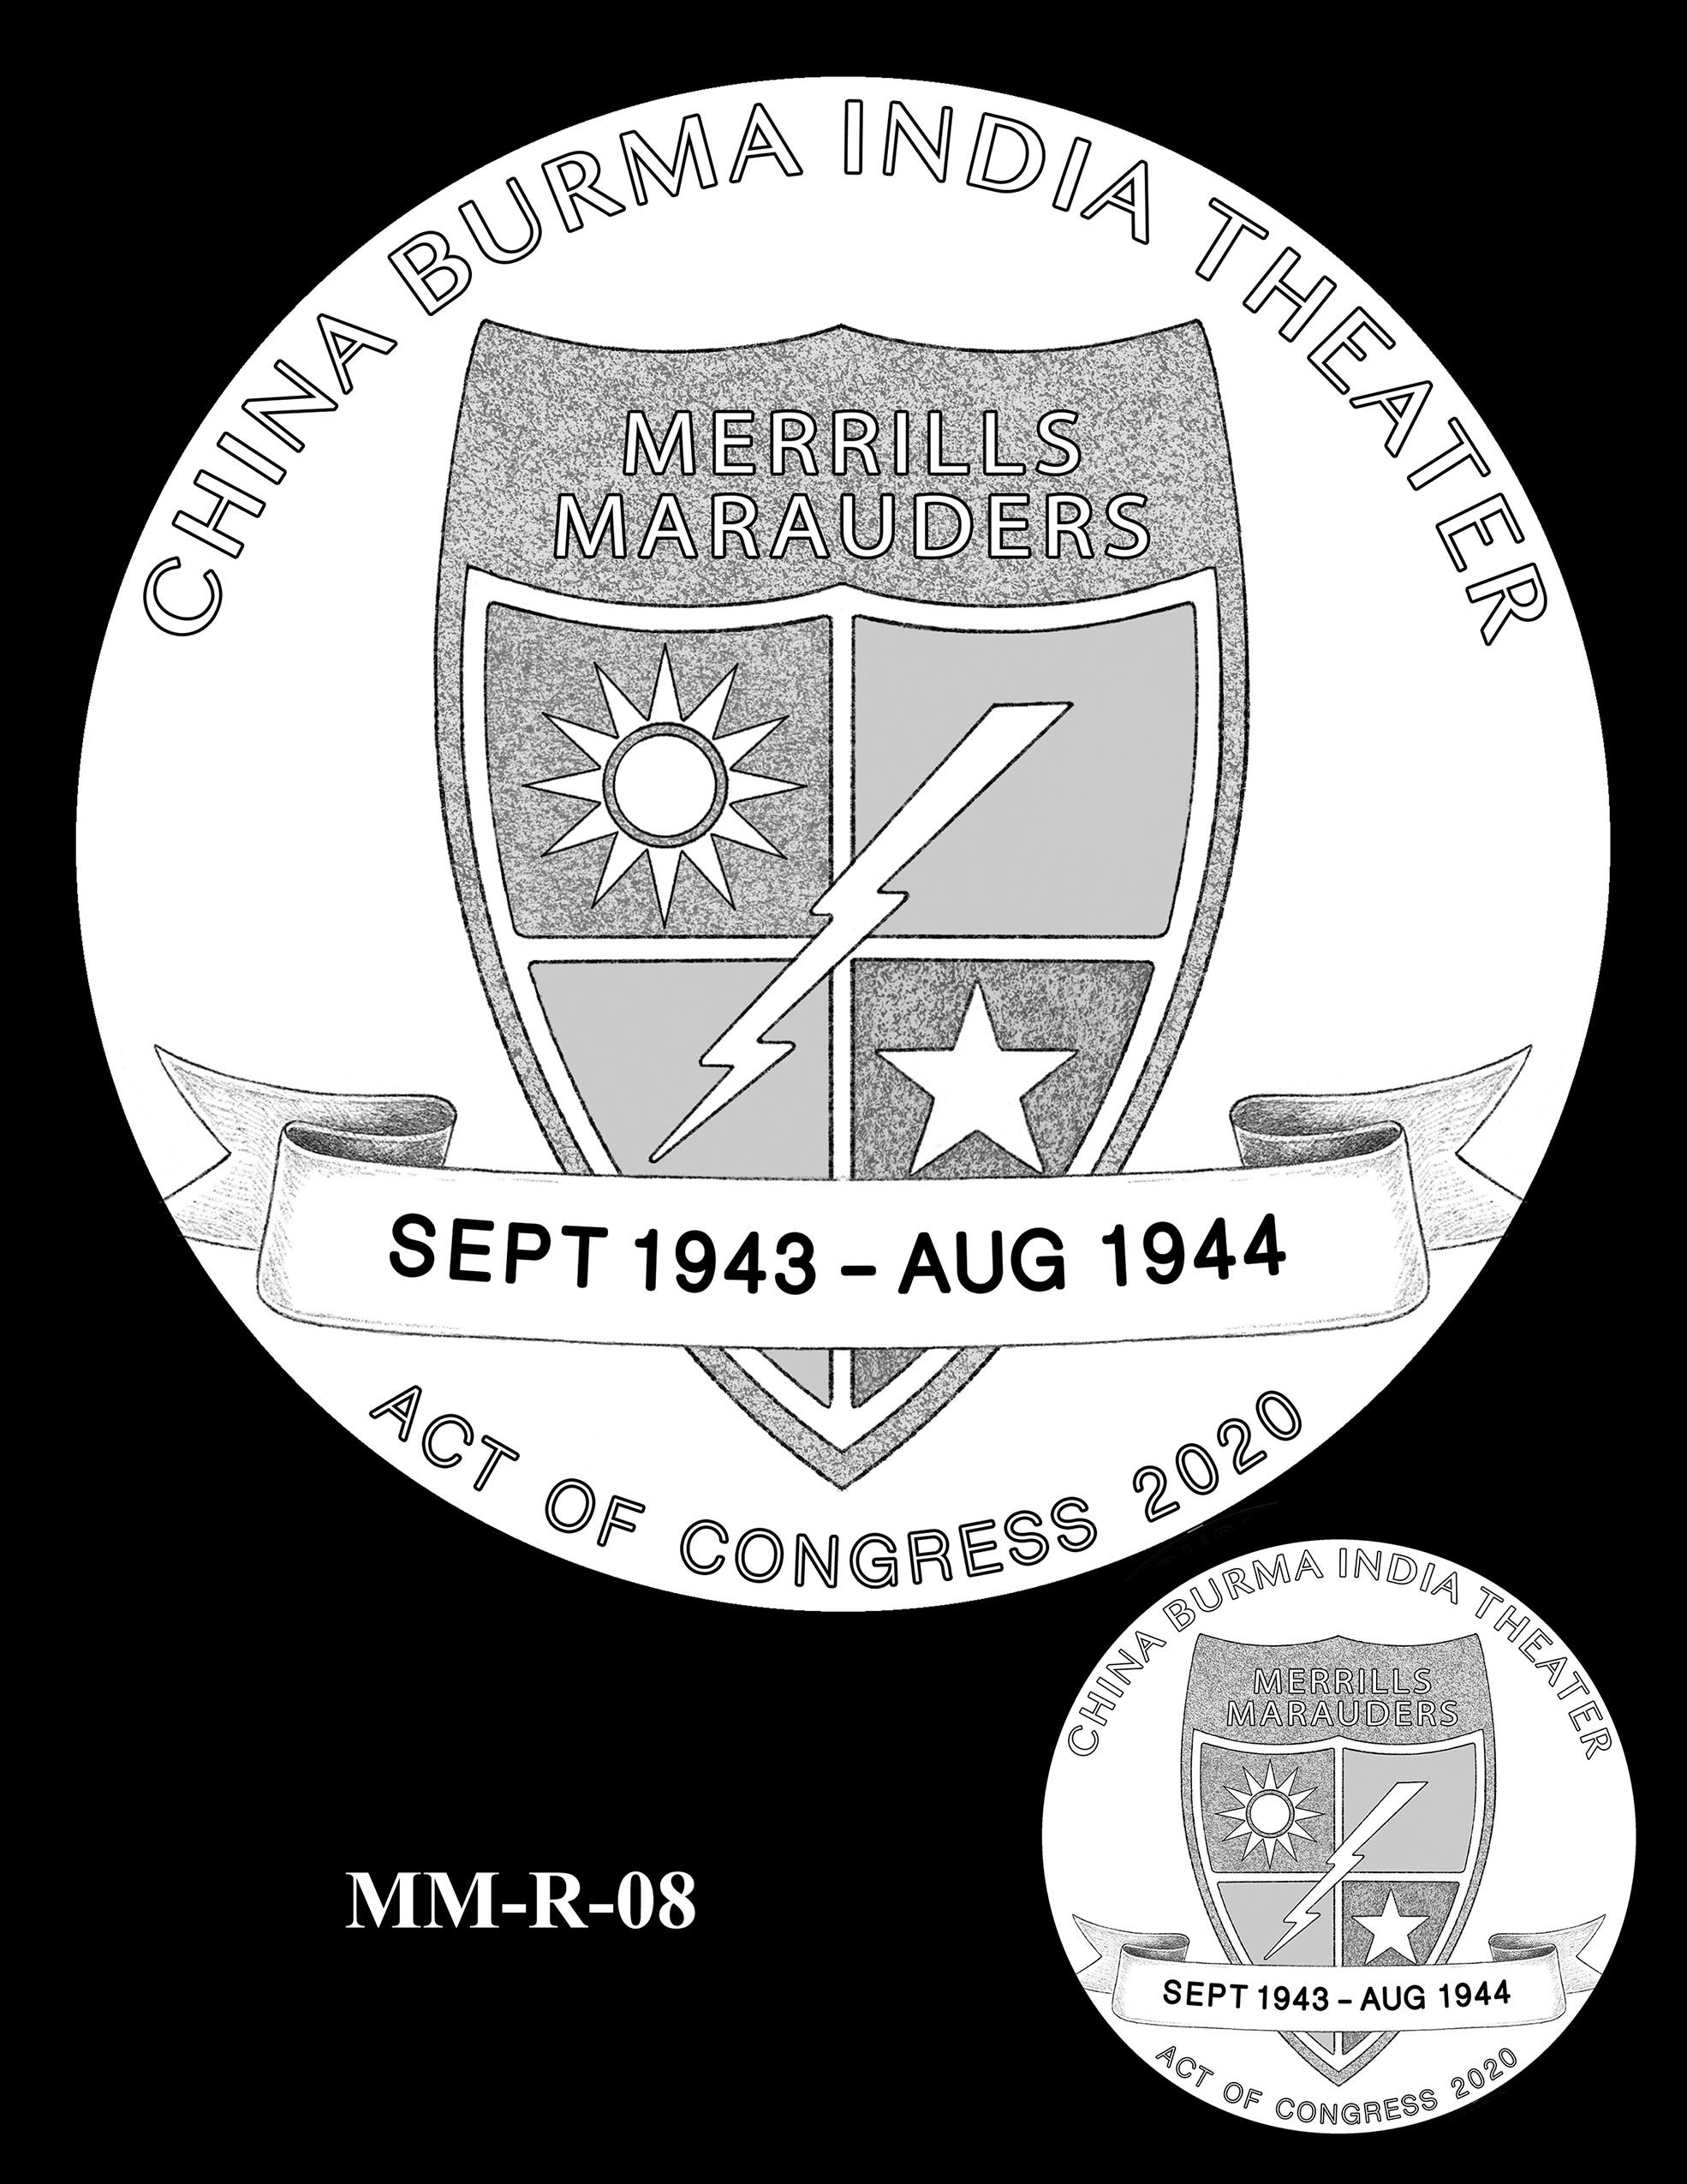 MM-R-08 -- Merrill's Marauders Congressional Gold Medal